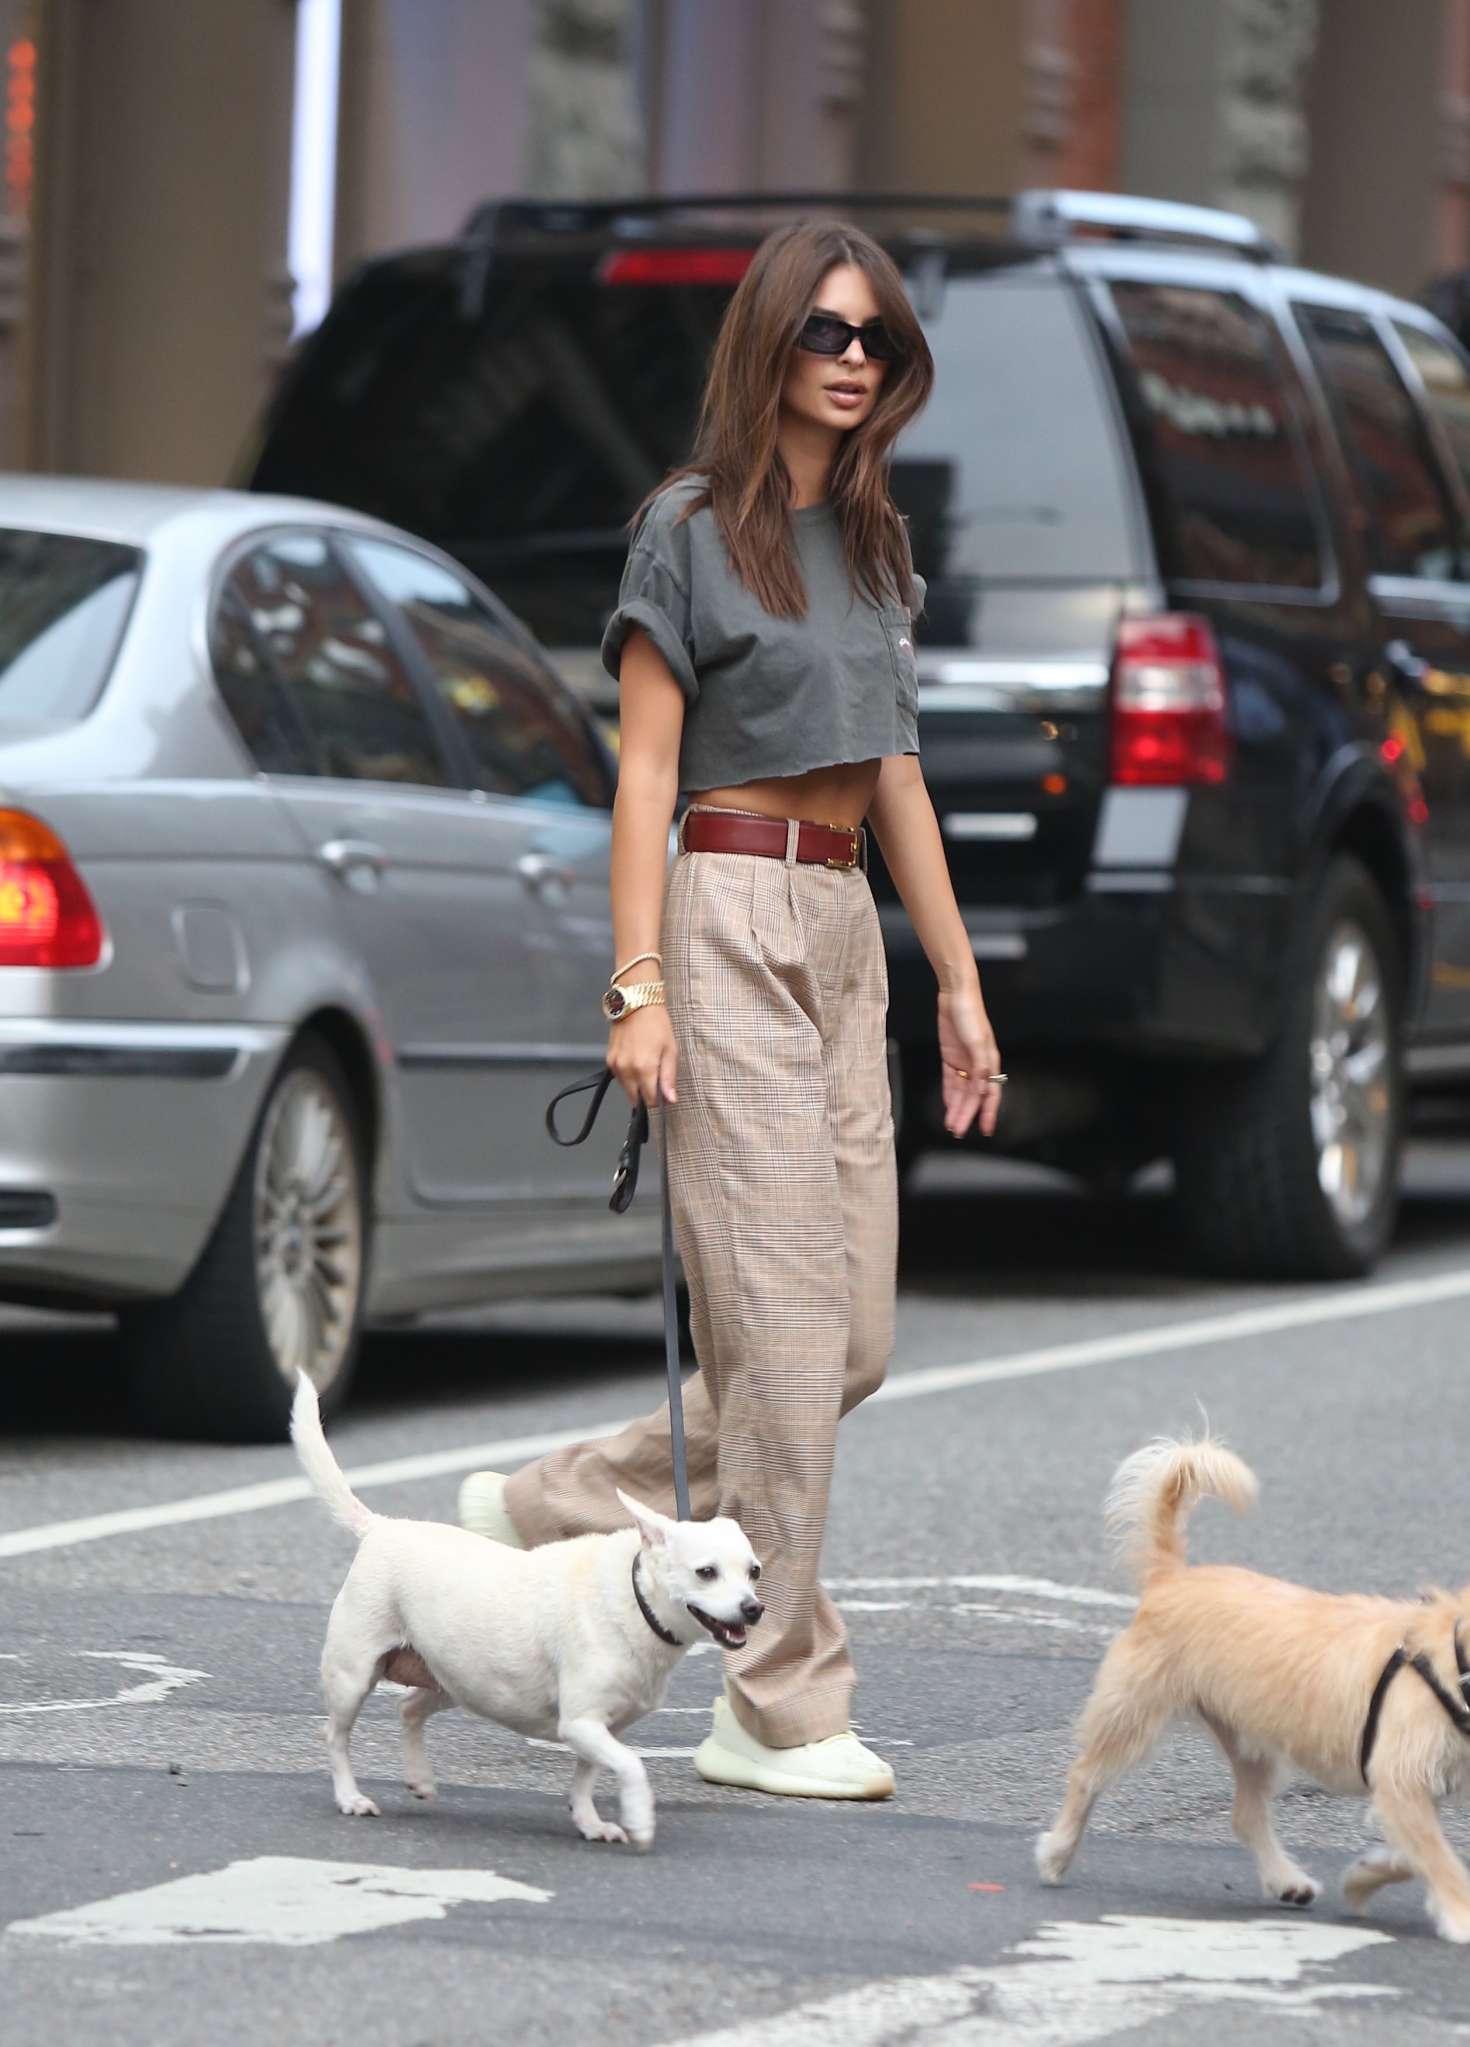 Emily Ratajkowski - Shopping with dogs in Soho